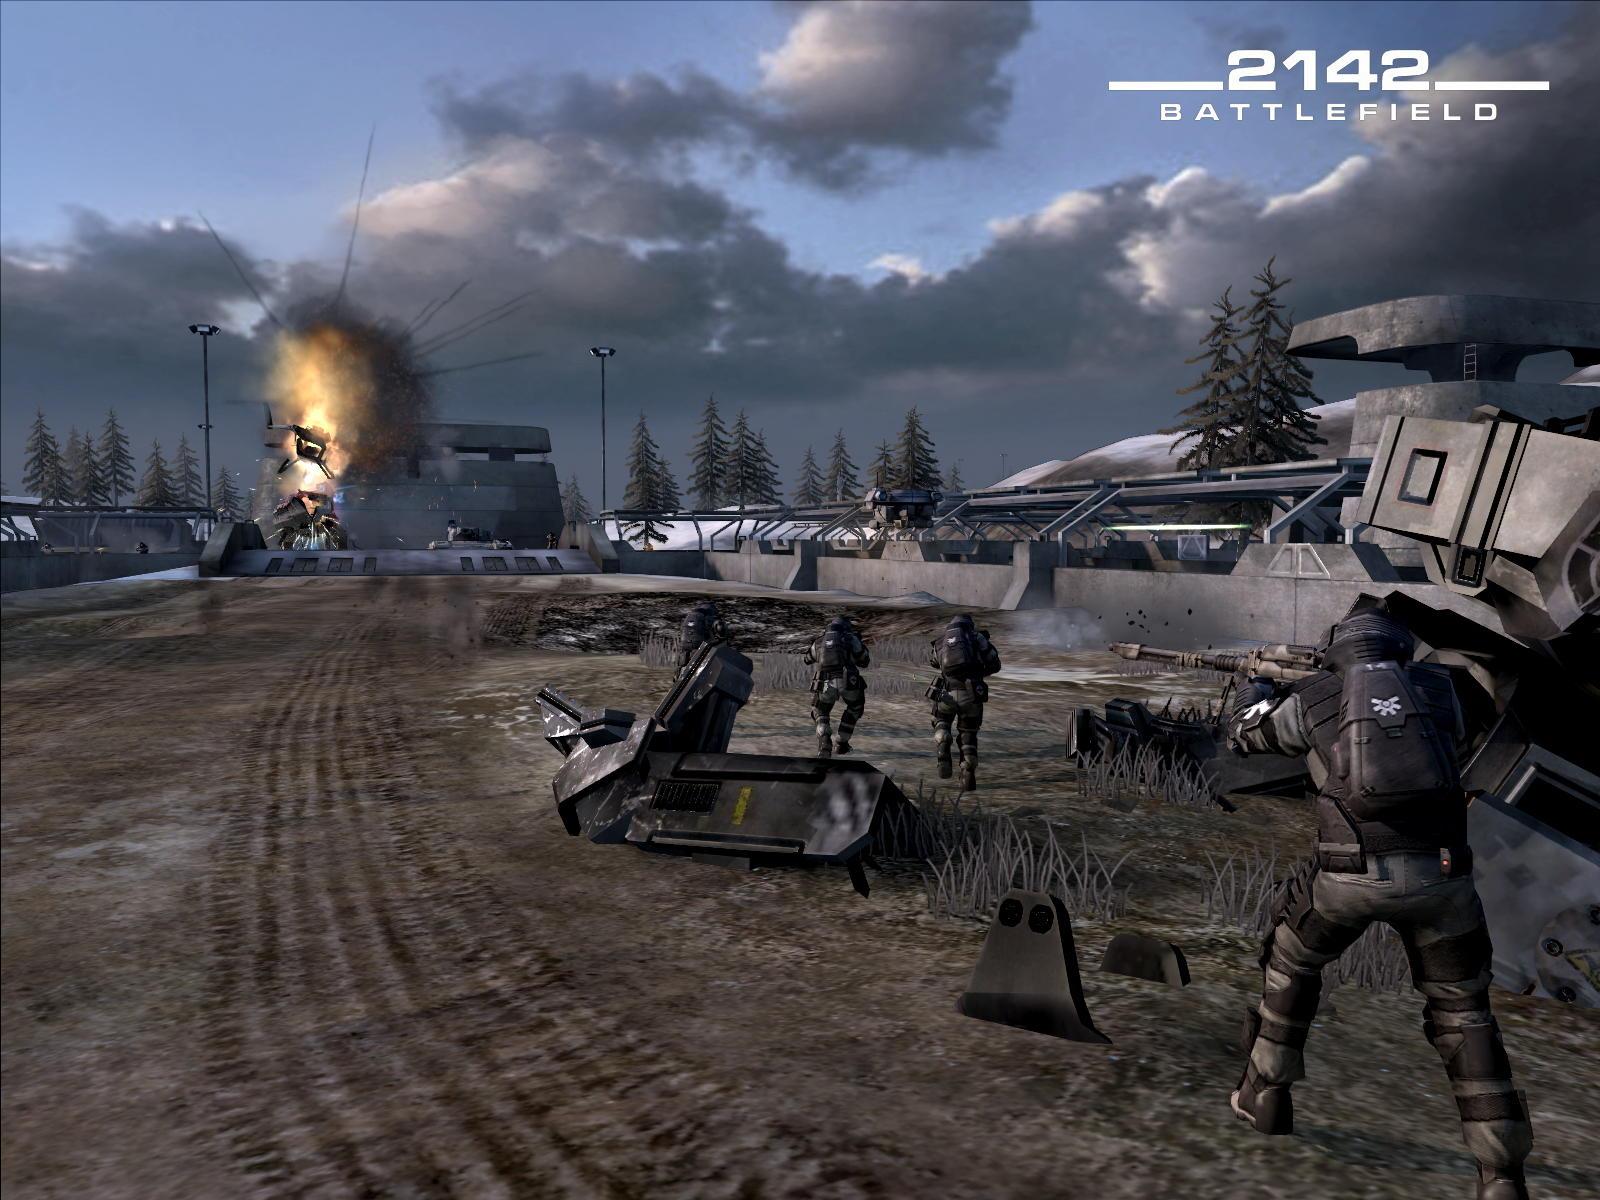 Battlefield 2142 mods unlocks